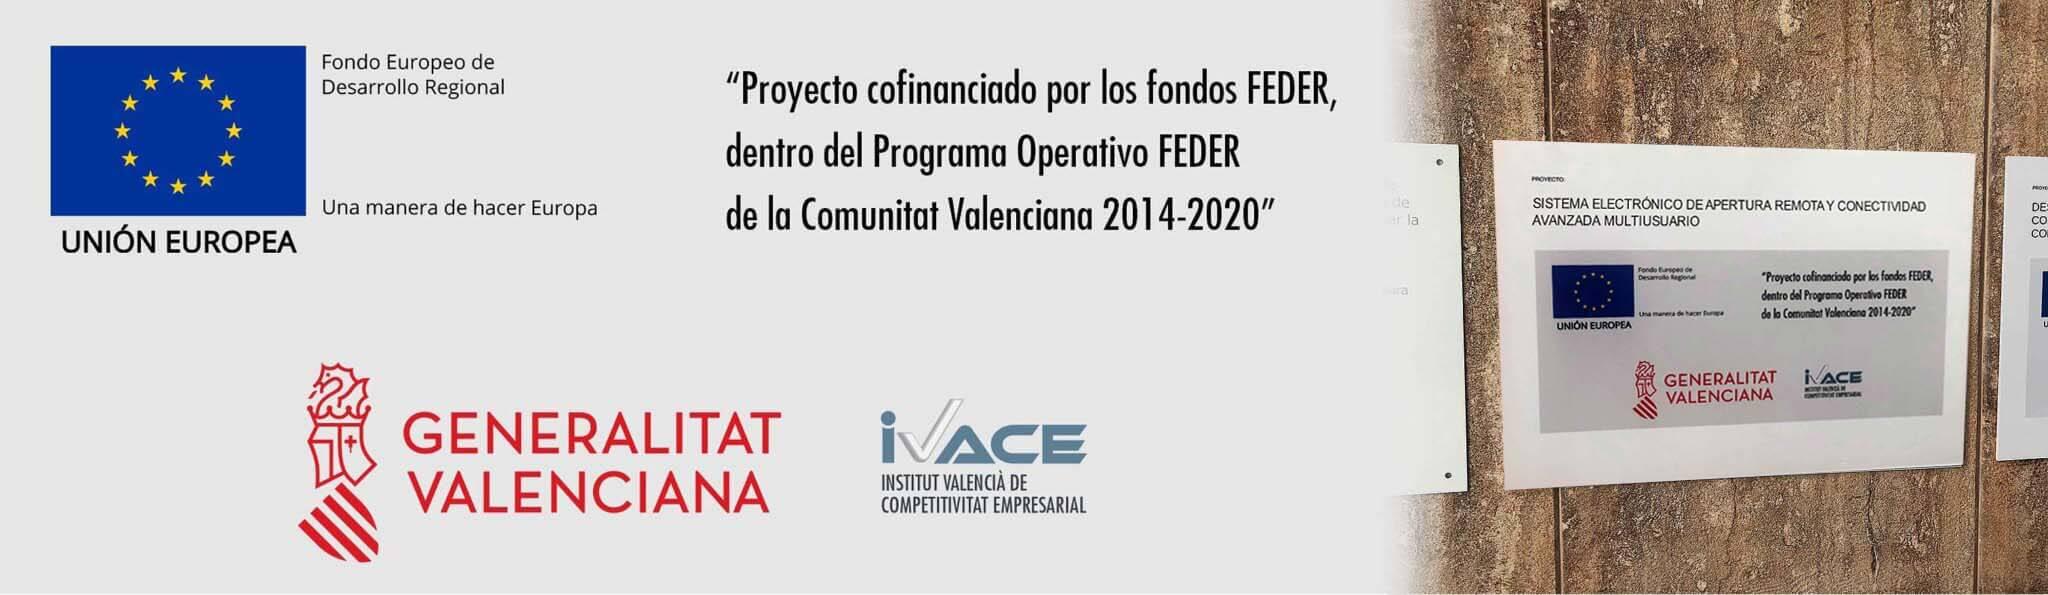 subvencion_IVACE_sistema_electronico_1